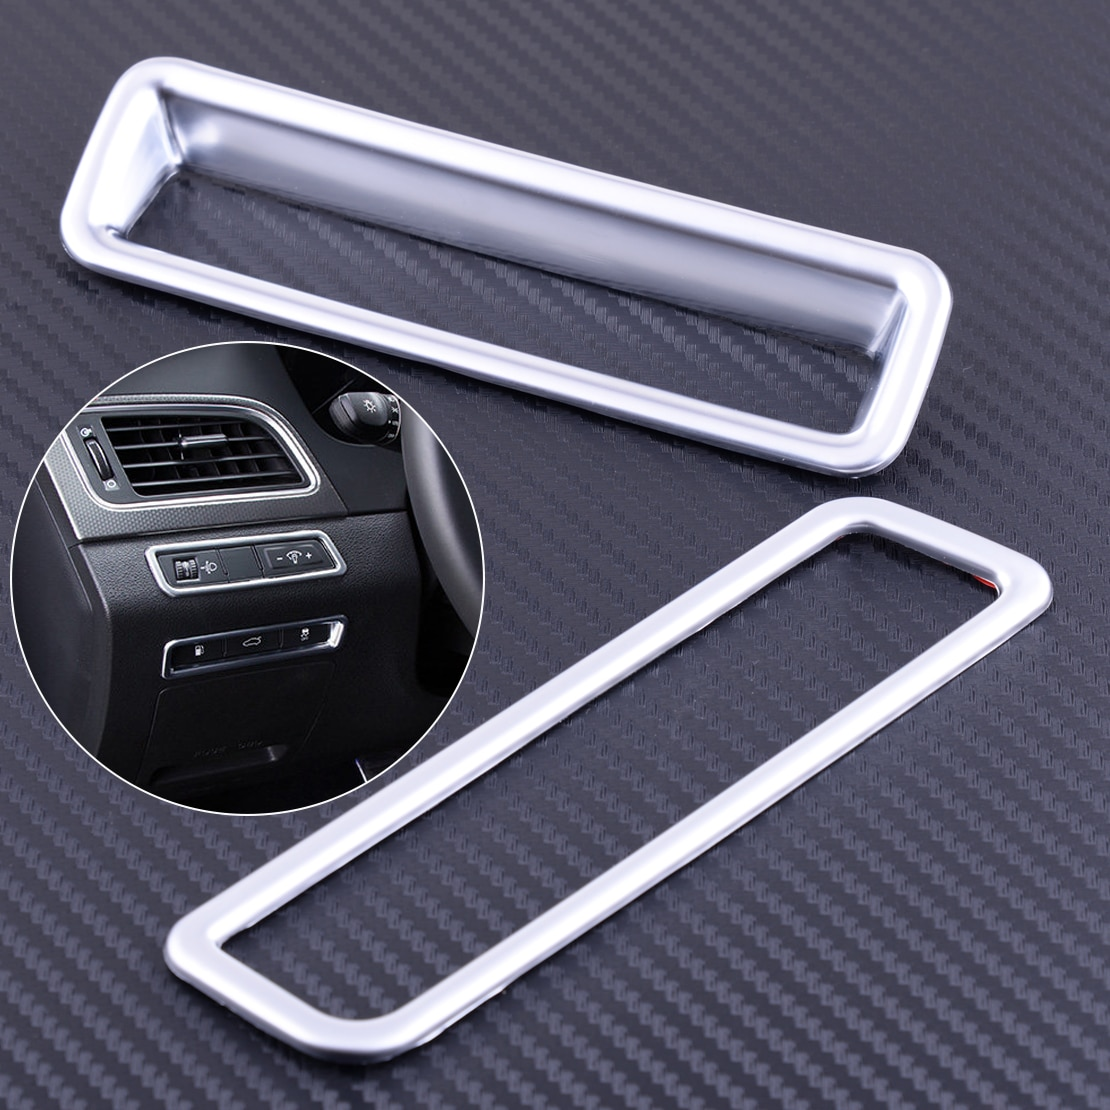 CITALL 2 uds Interior cromo consola central cubierta de Panel de interruptor de Control ajuste para Hyundai Sonata / i45 (LF) 2015 2016 2017